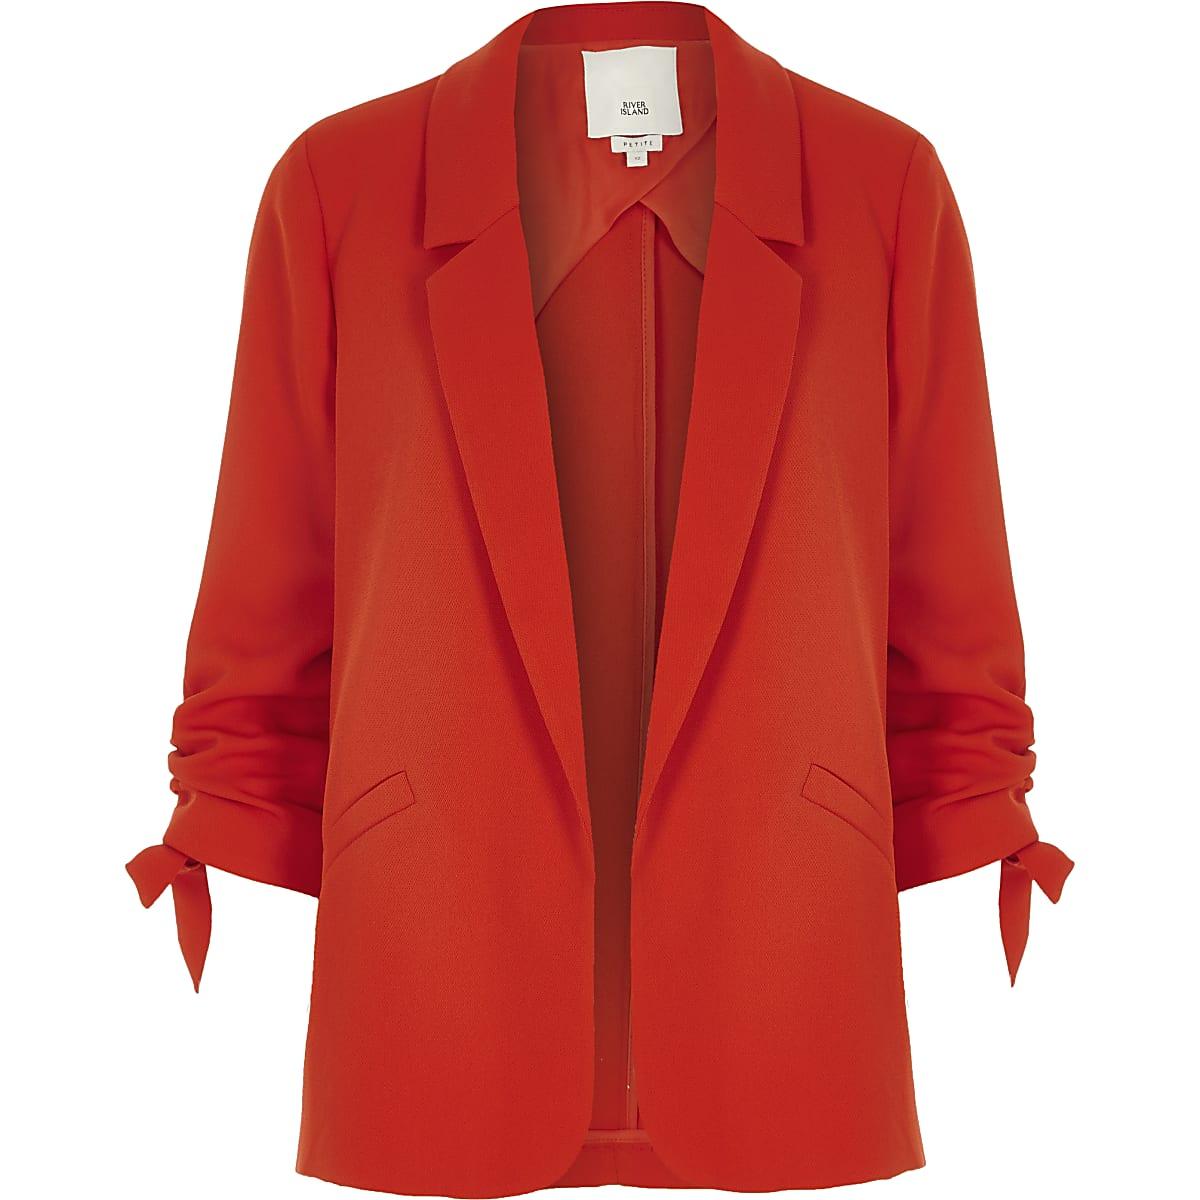 b30161b430e00 Petite red ruched sleeve blazer - Blazers - Coats & Jackets - women